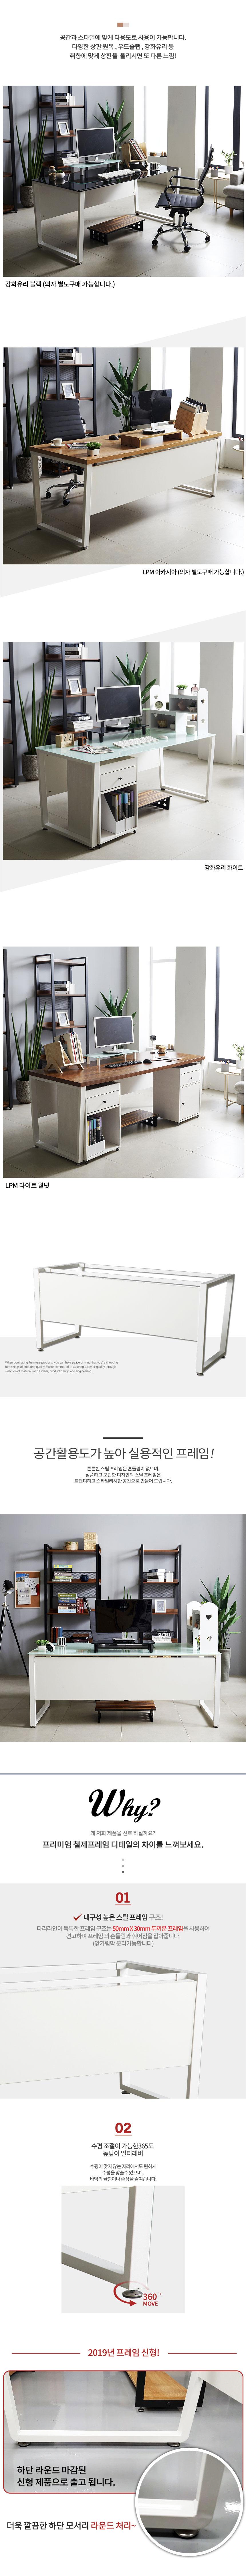 K54 1800 책상프레임 - 동화속나무, 174,000원, DIY 책상/의자, DIY 책상/테이블